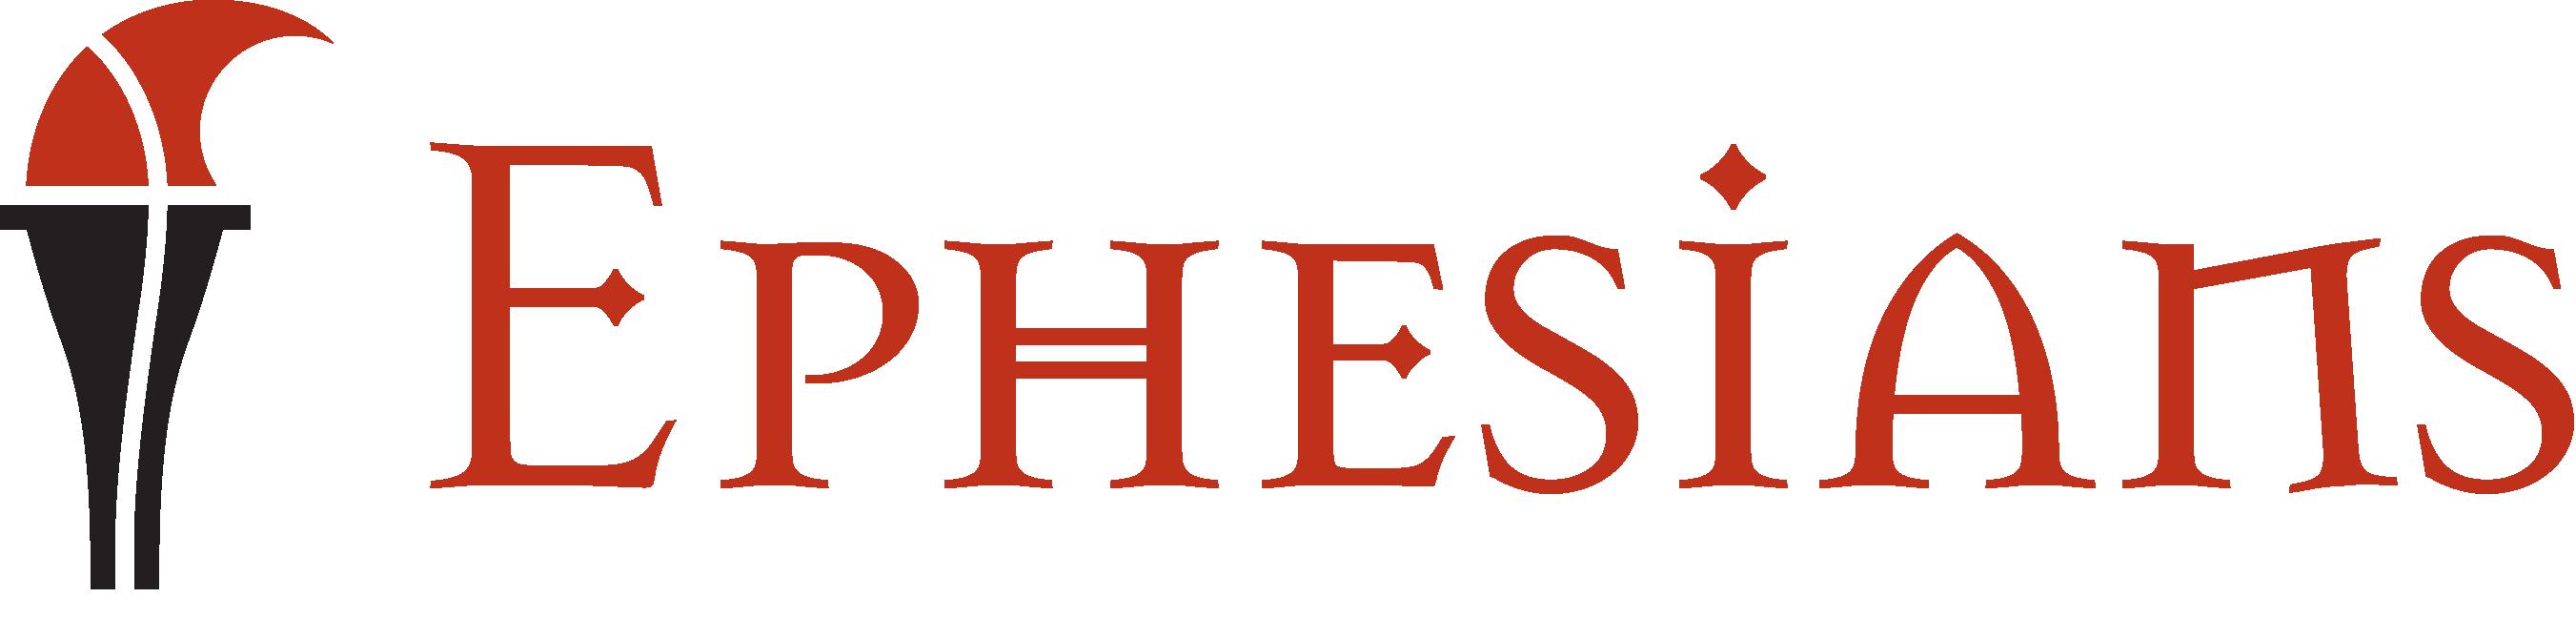 Ephesians PNG-PlusPNG.com-2703 - Ephesians PNG